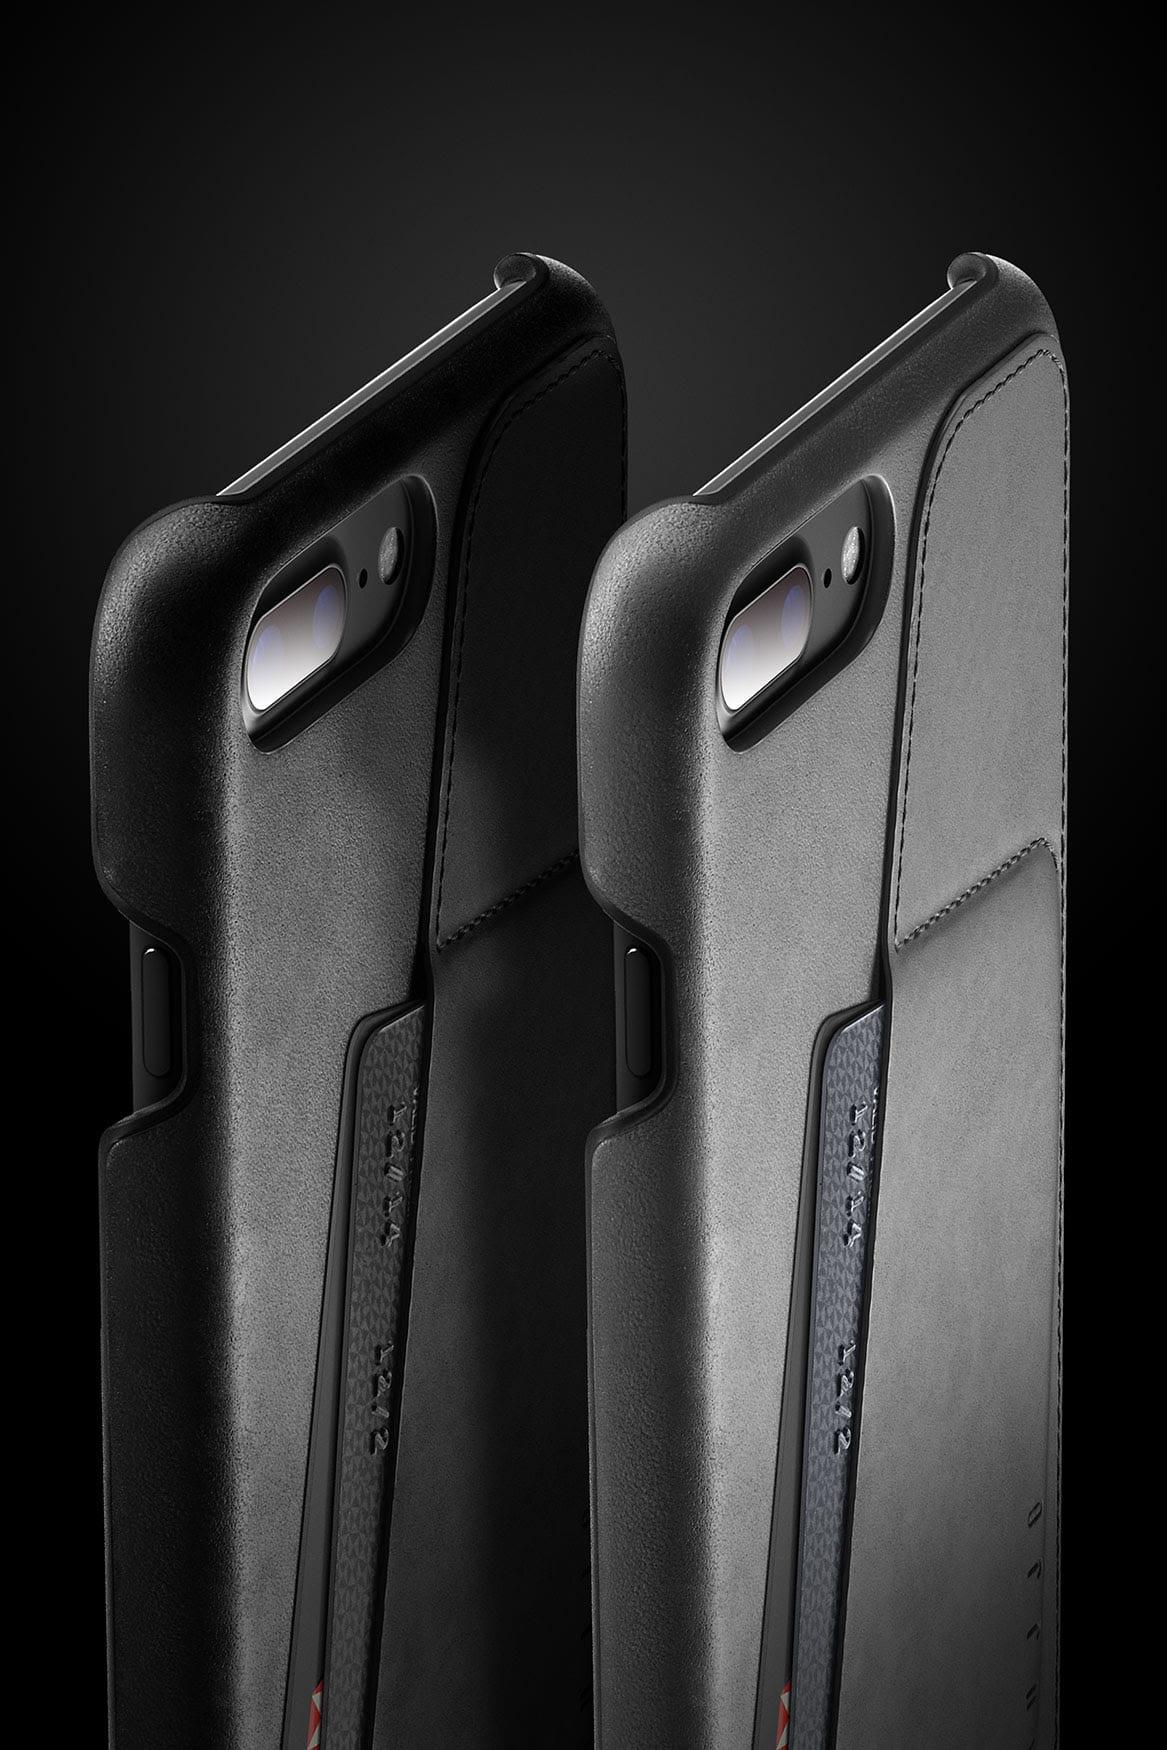 custodia iphone 7 tessere